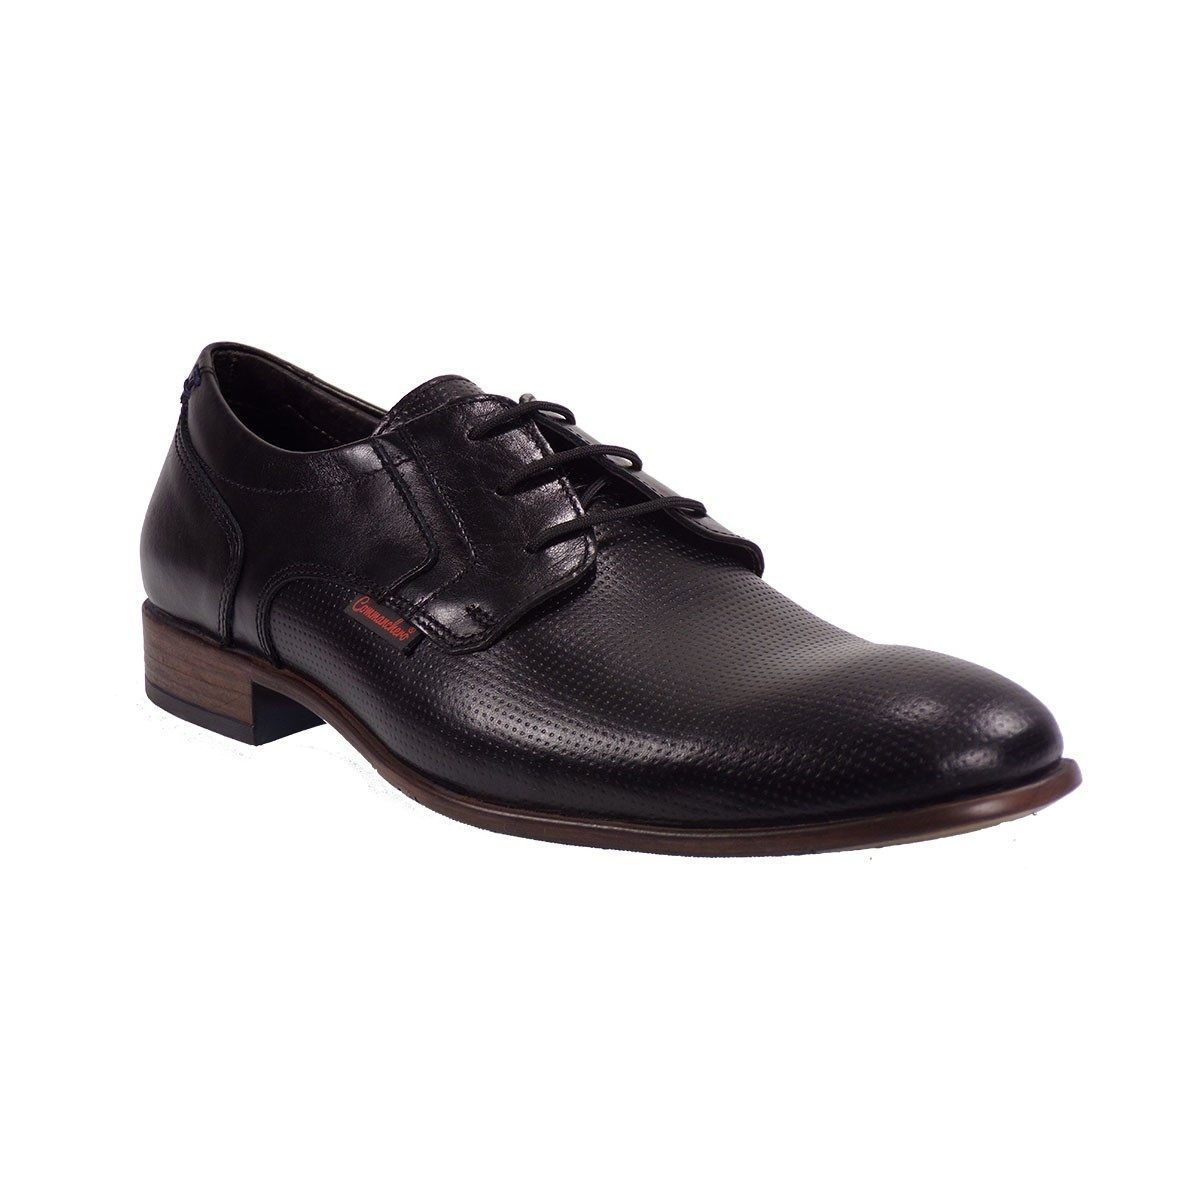 Commanchero Ανδρικά Παπούτσια 91629 Μαύρο Δέρμα